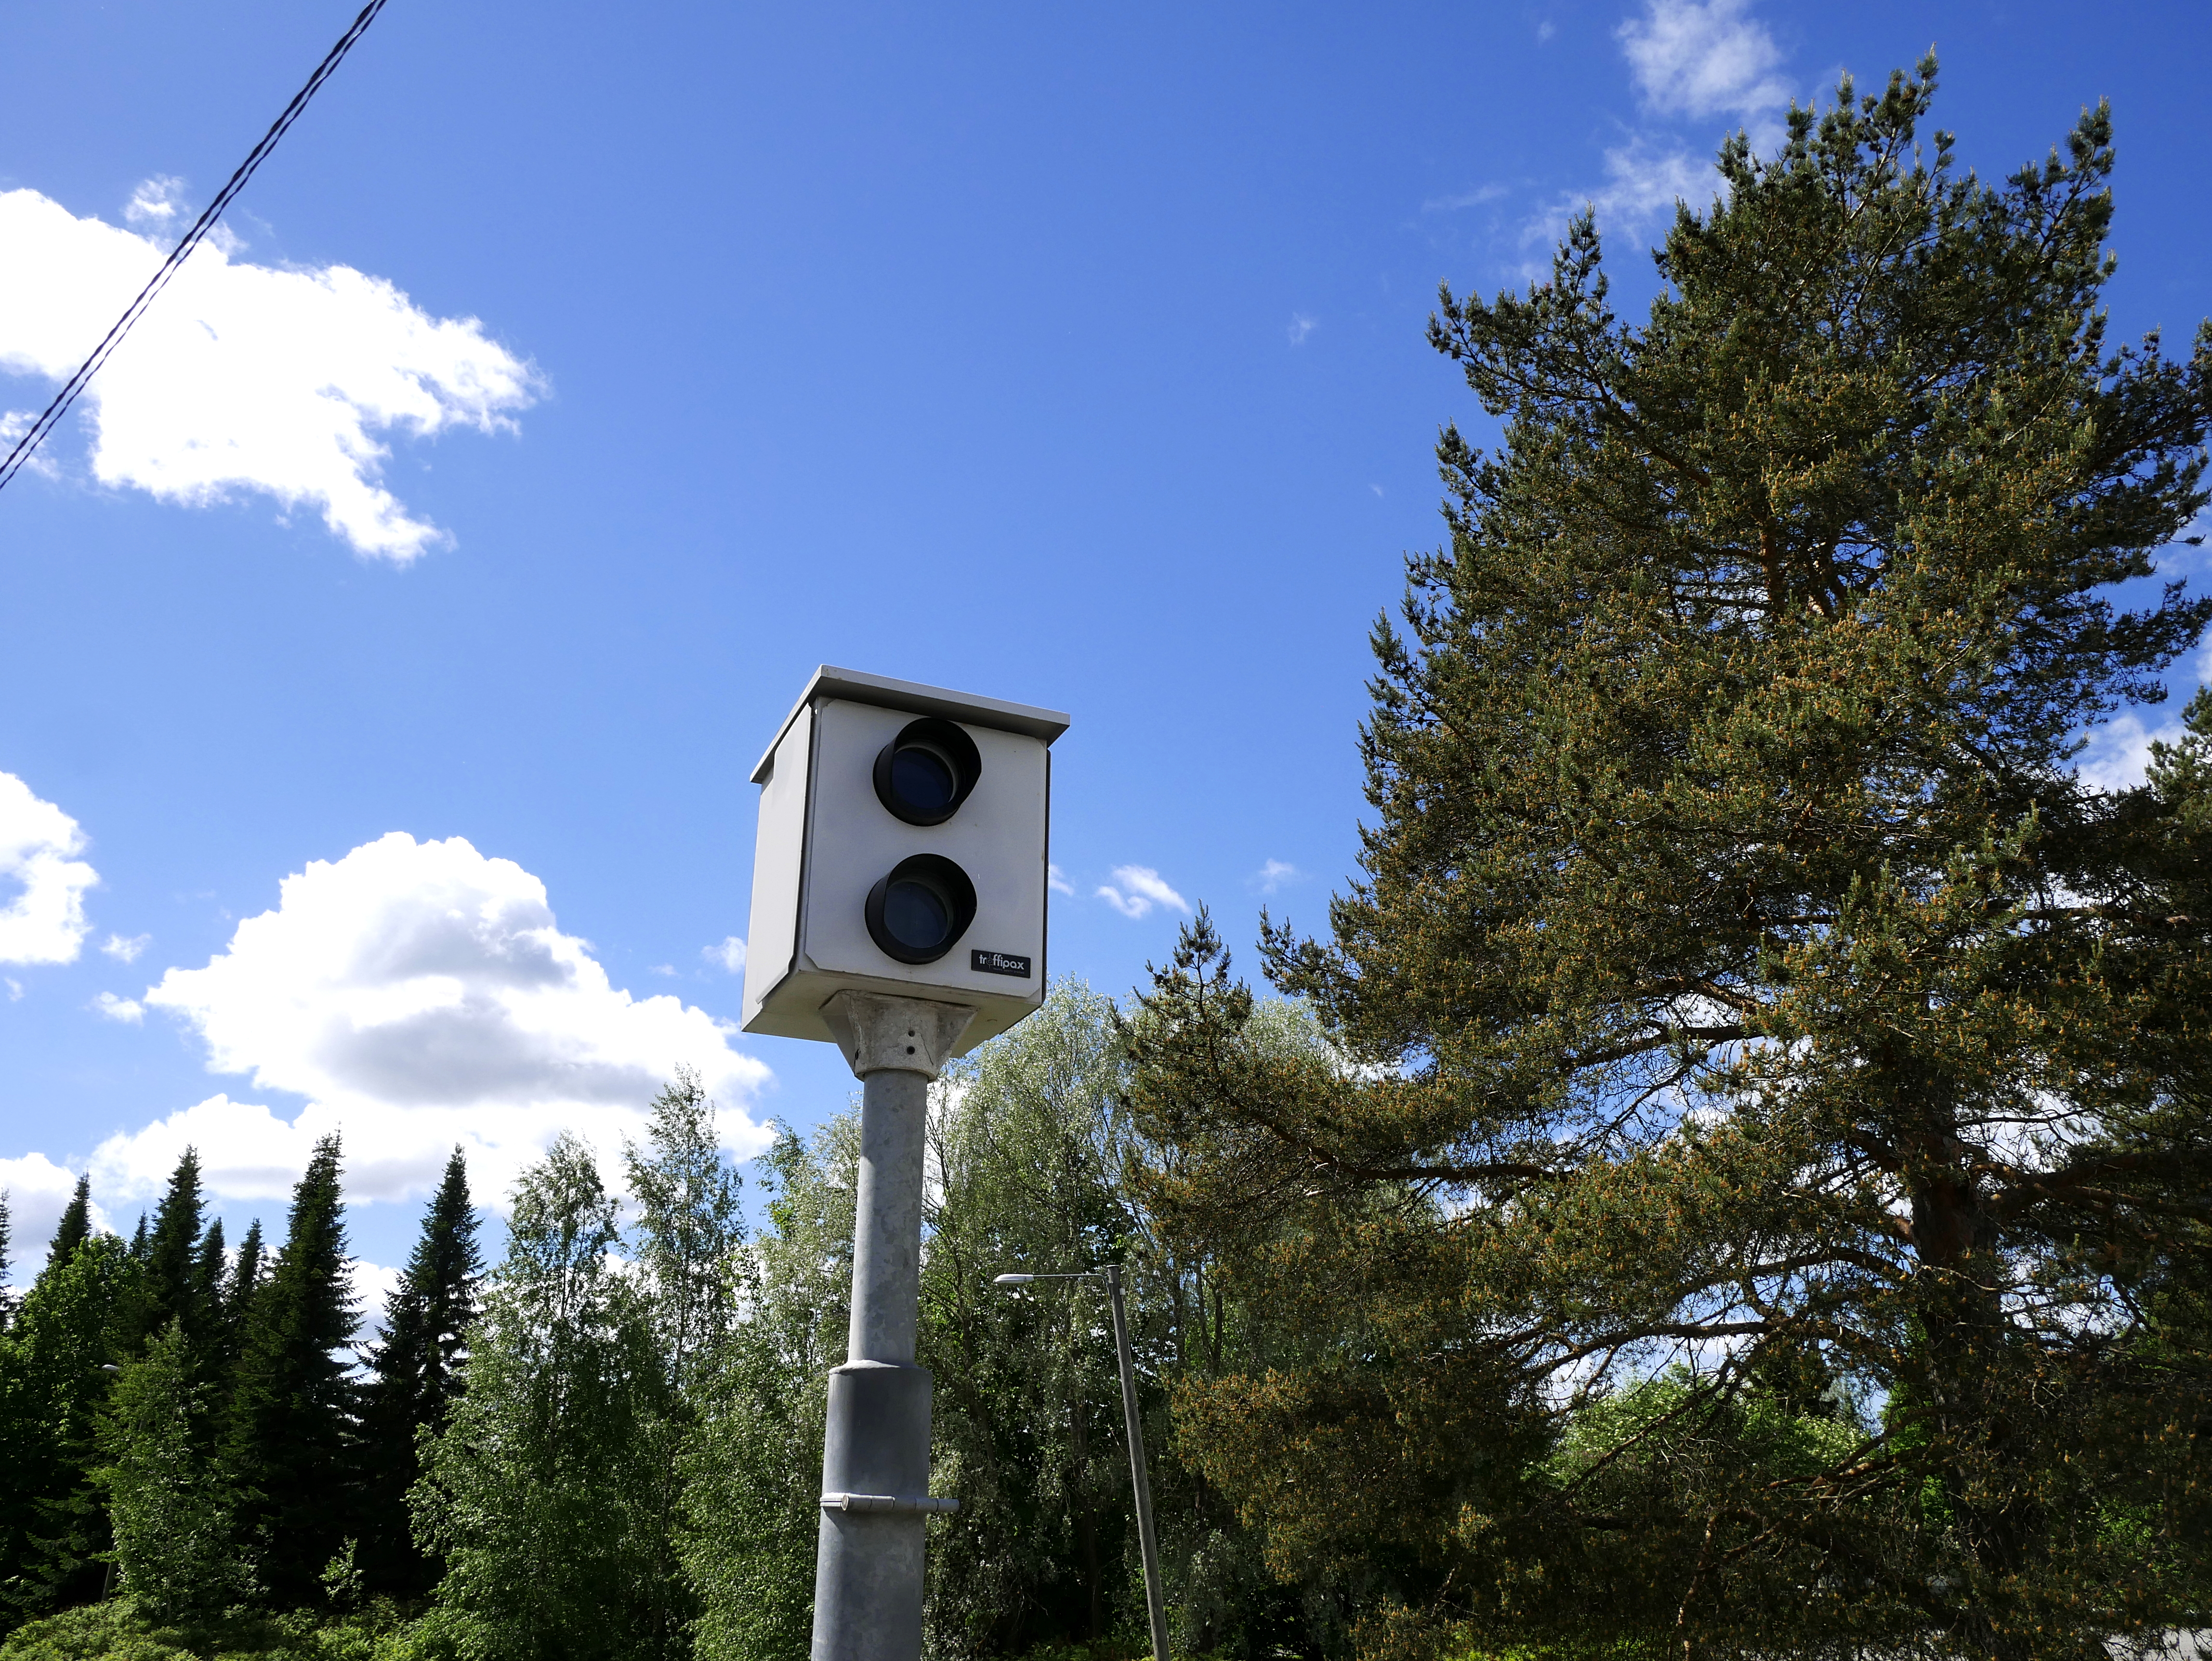 vitesse, excès de vitesse, vitesse excessive, flasher, opération radar, Calculateur d'amende